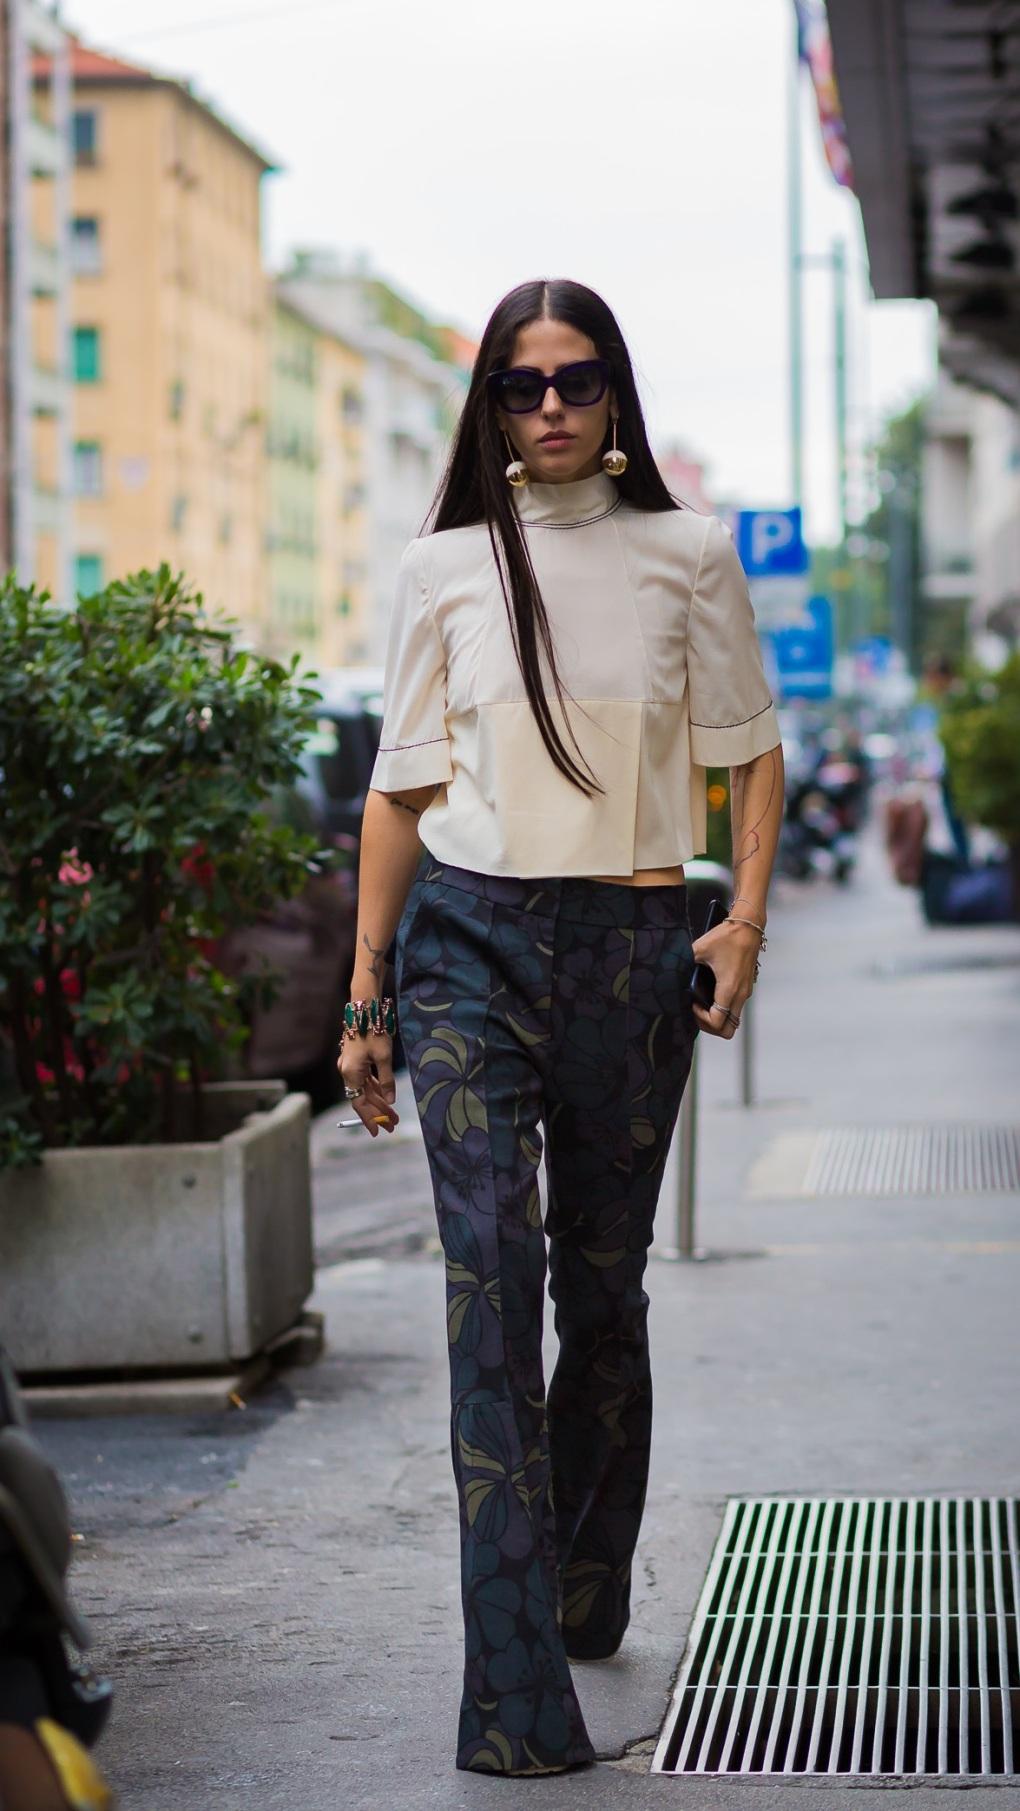 Gilda-Ambrosio-by-STYLEDUMONDE-Street-Style-Fashion-PhotographyGH5D5459.jpg